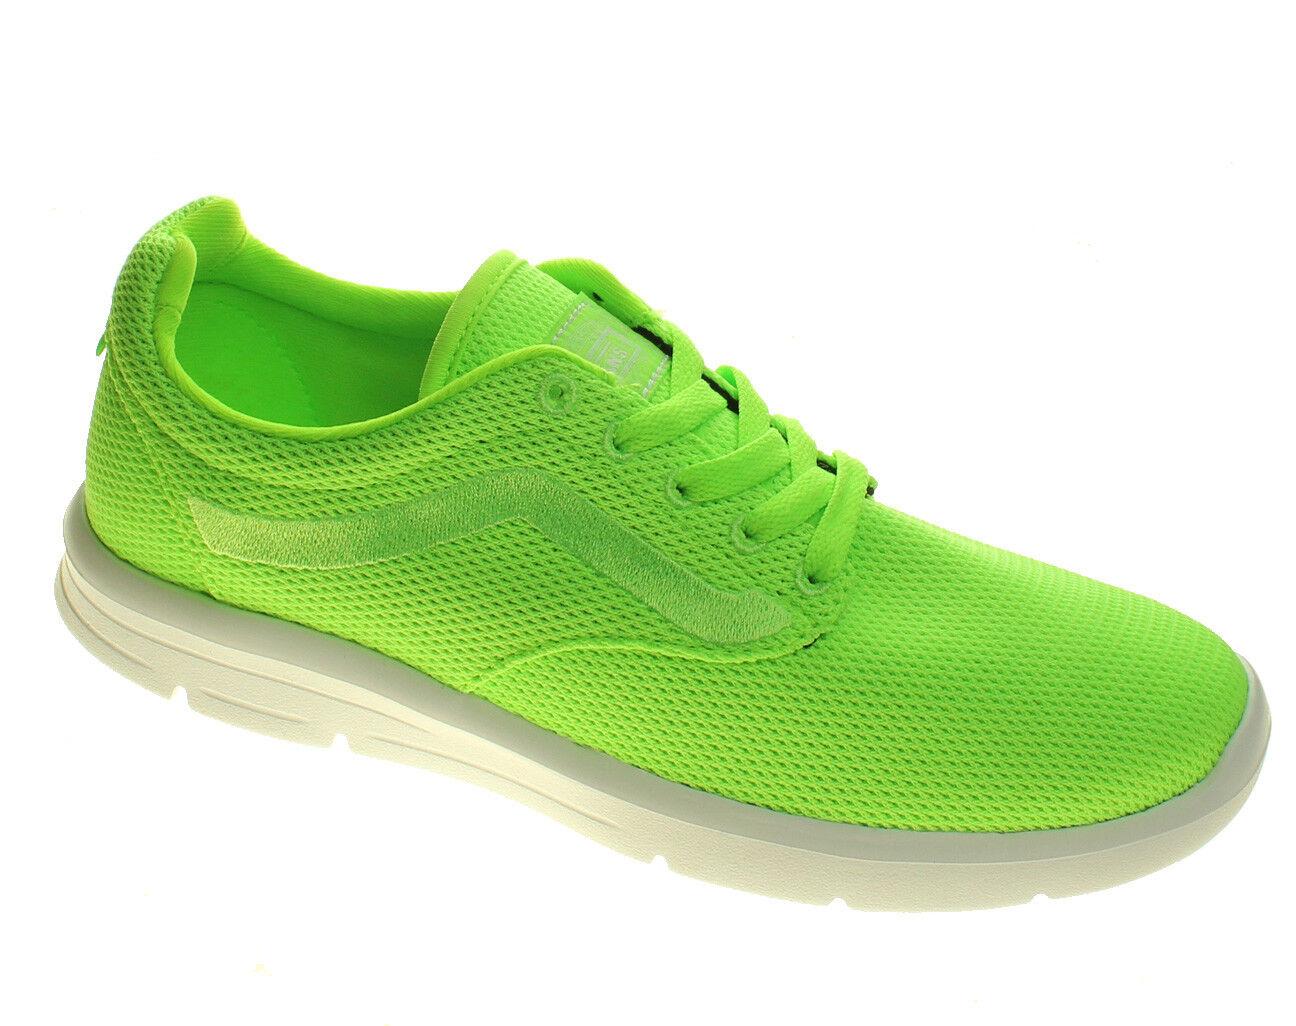 VANS ISO 1.5 Gecko Vert UltraCush Trainer Chaussures Homme 6.5 Femme 7